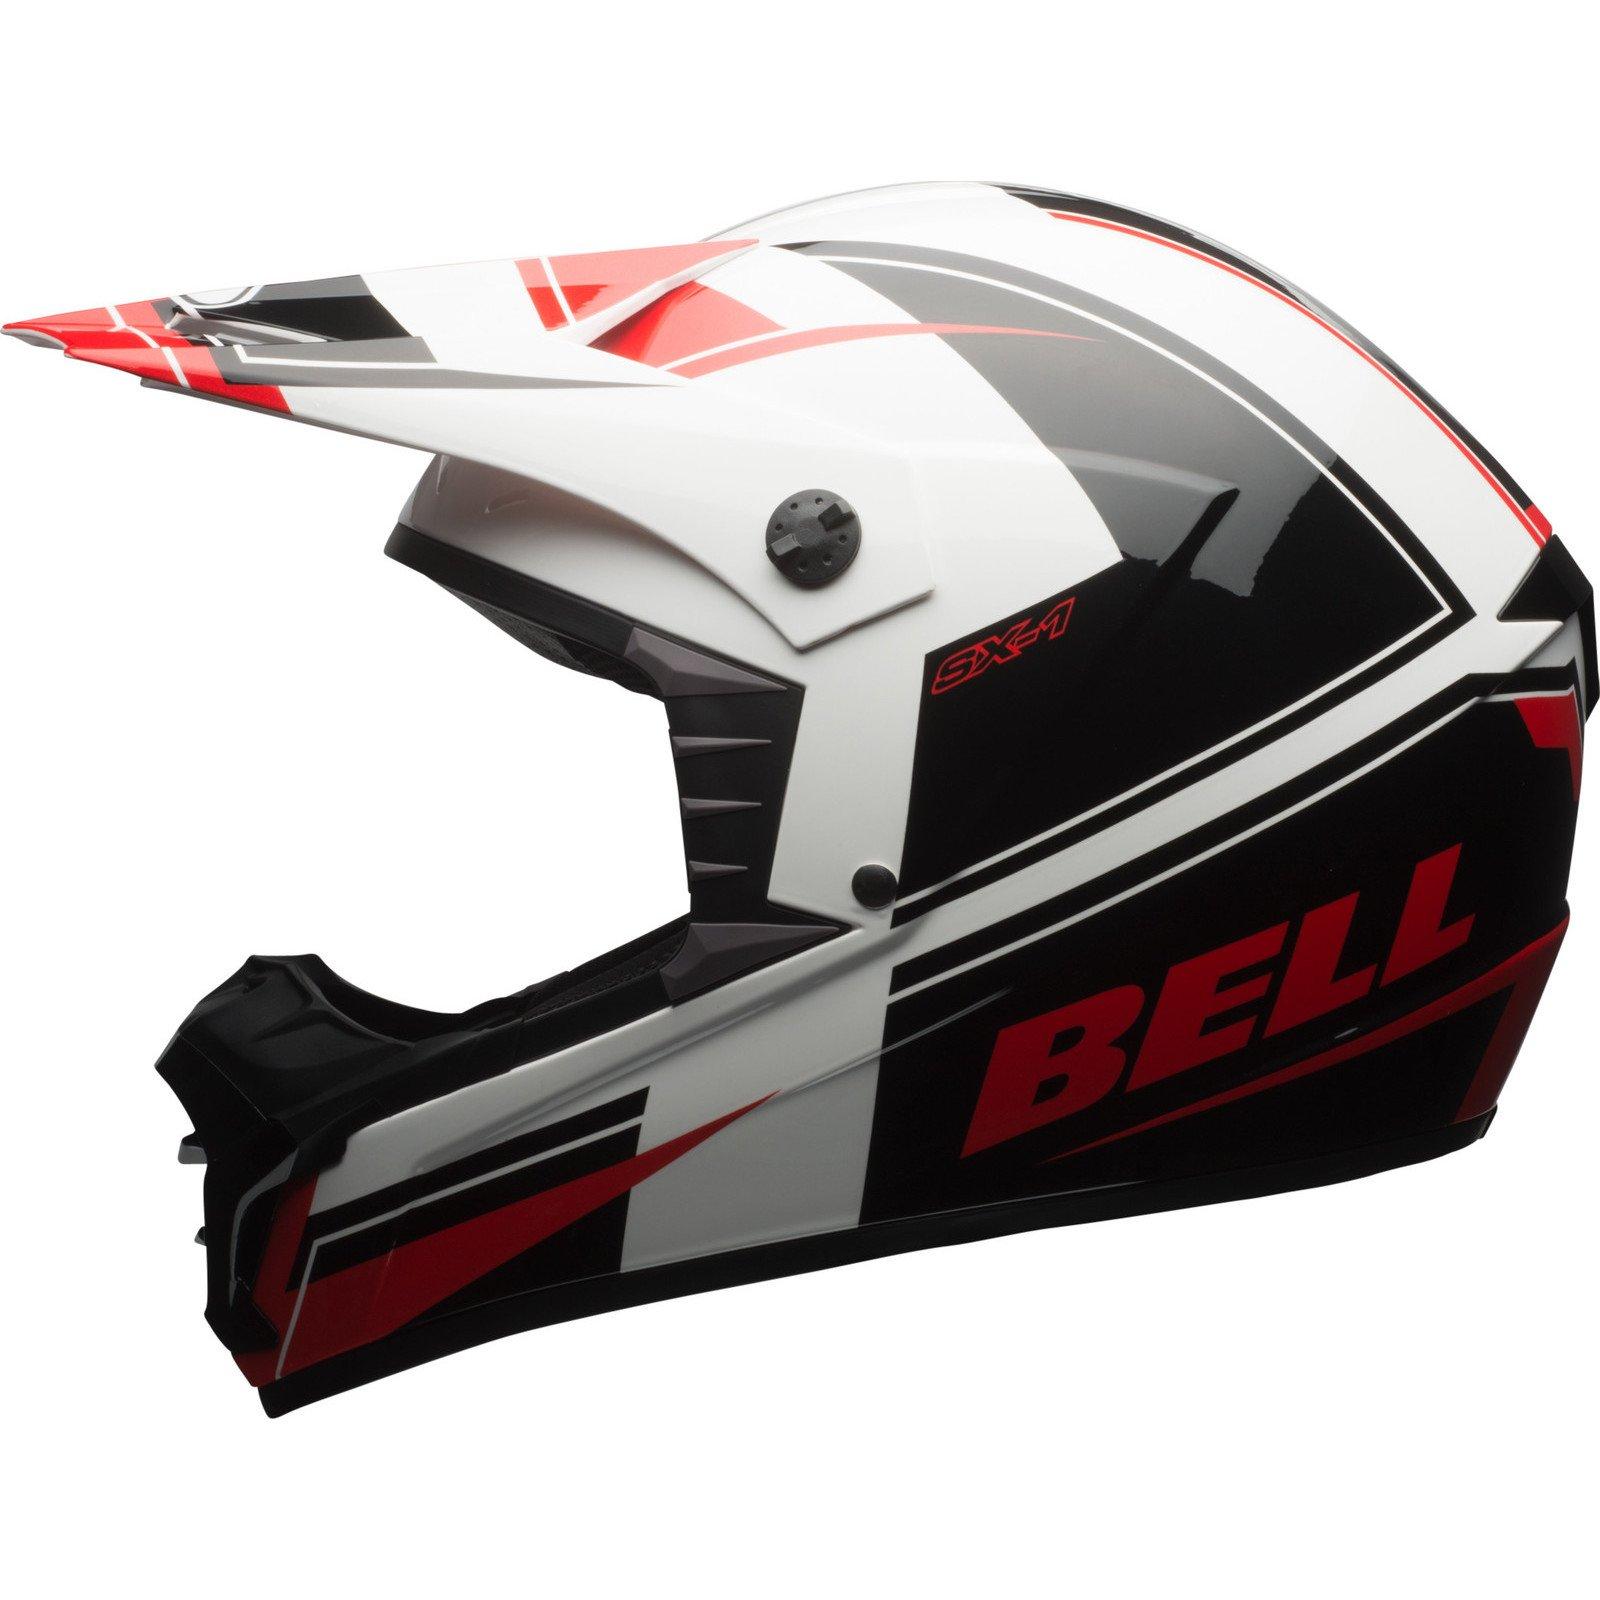 Bell caschi MX 2017sx-1Adult casco, Holeshot rosso/nero, taglia 2x S